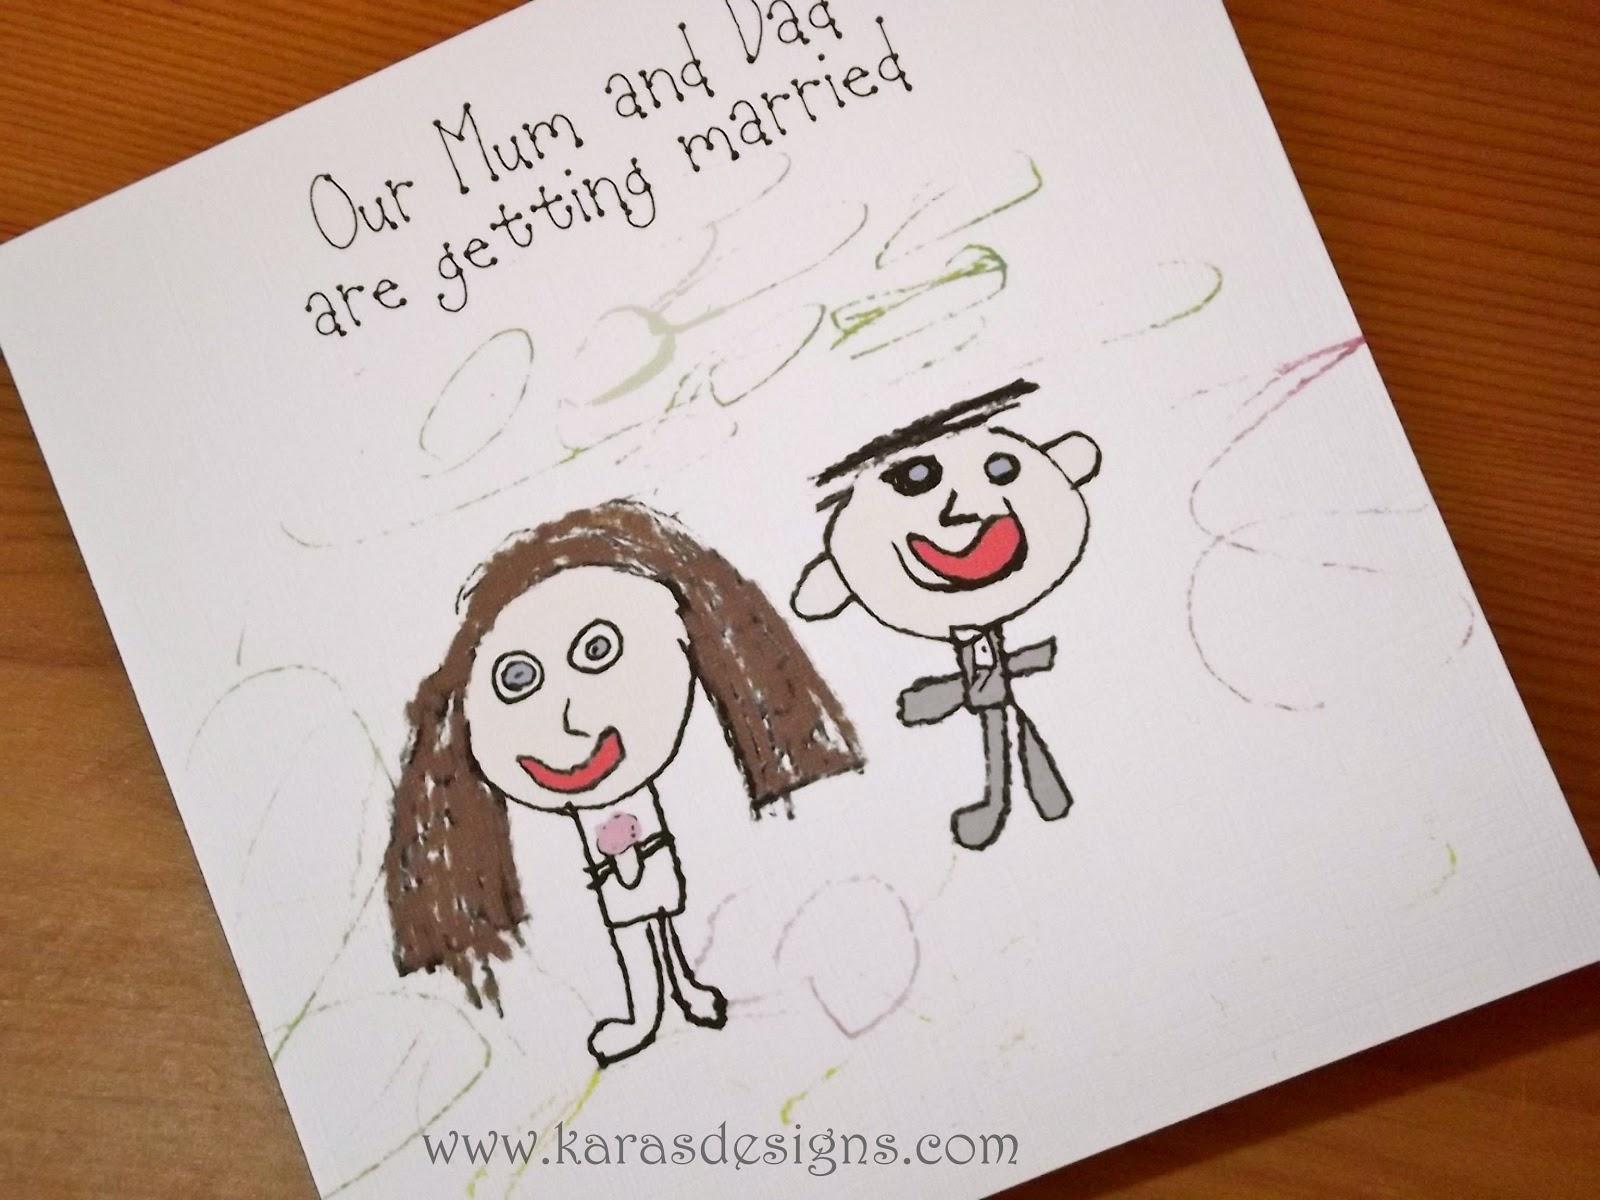 www.karasdesigns.com: Kids Drawn Wedding Invites.